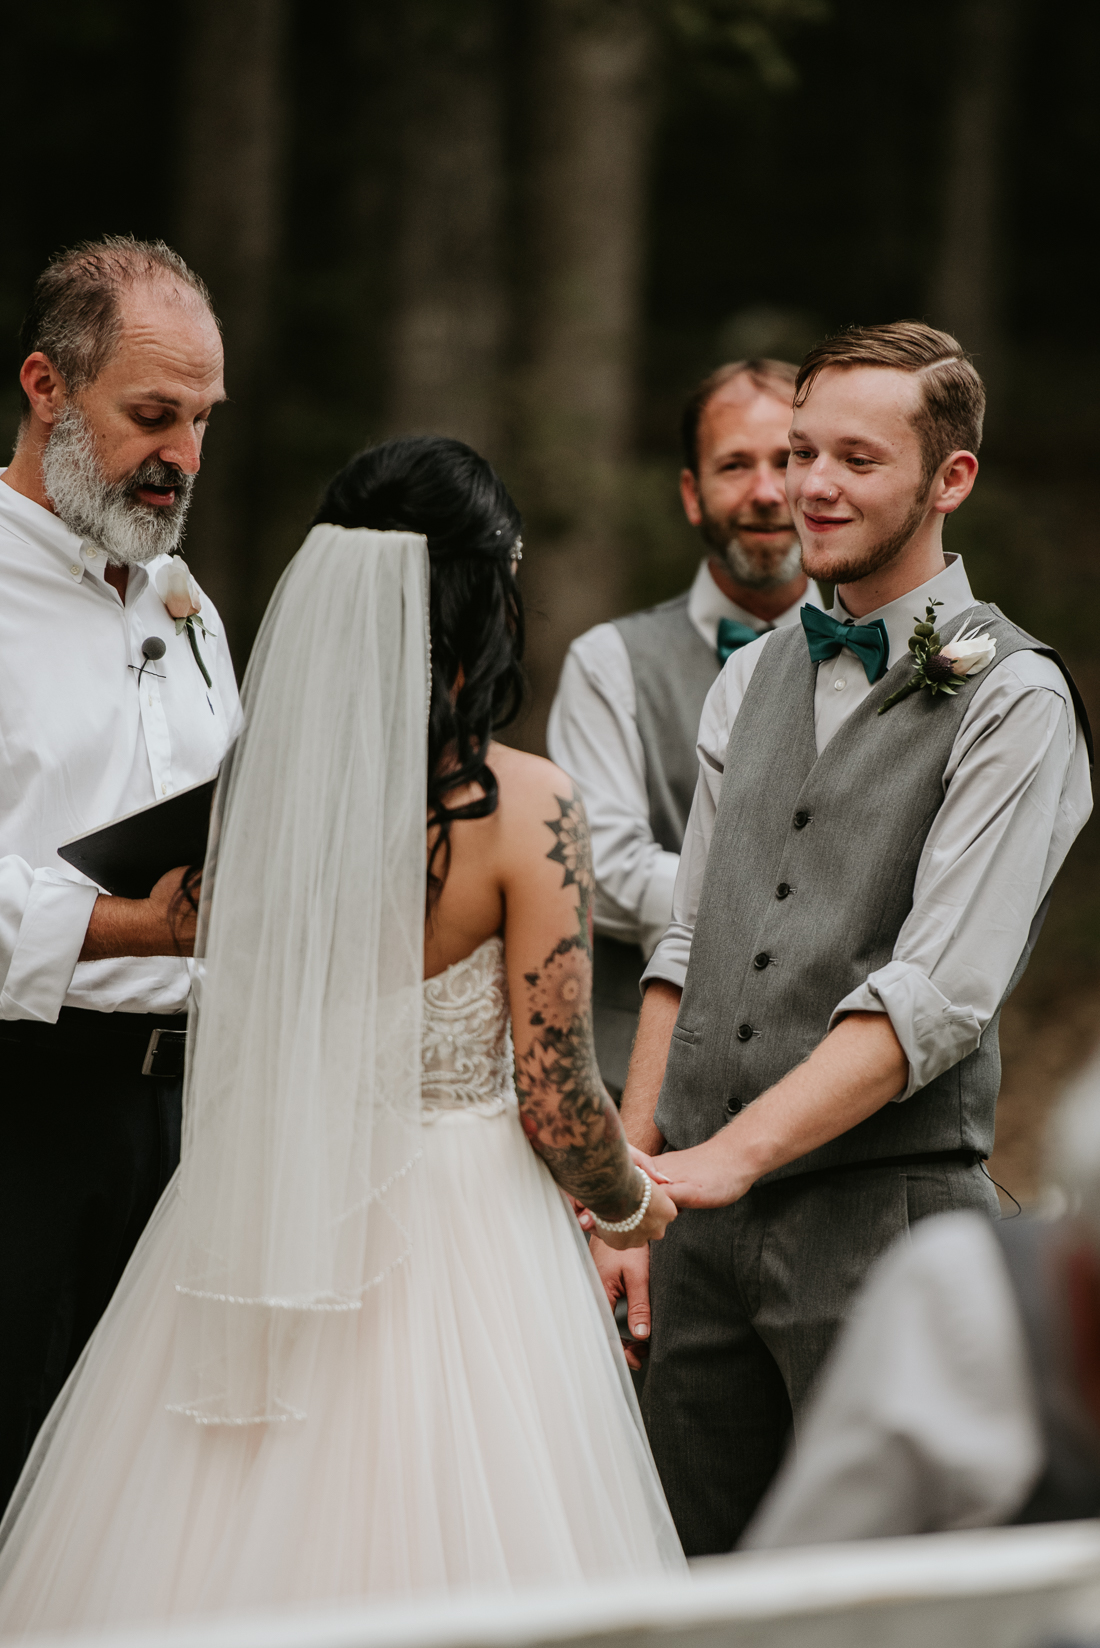 olivia_zay_wedding_09_2018-7670.jpg